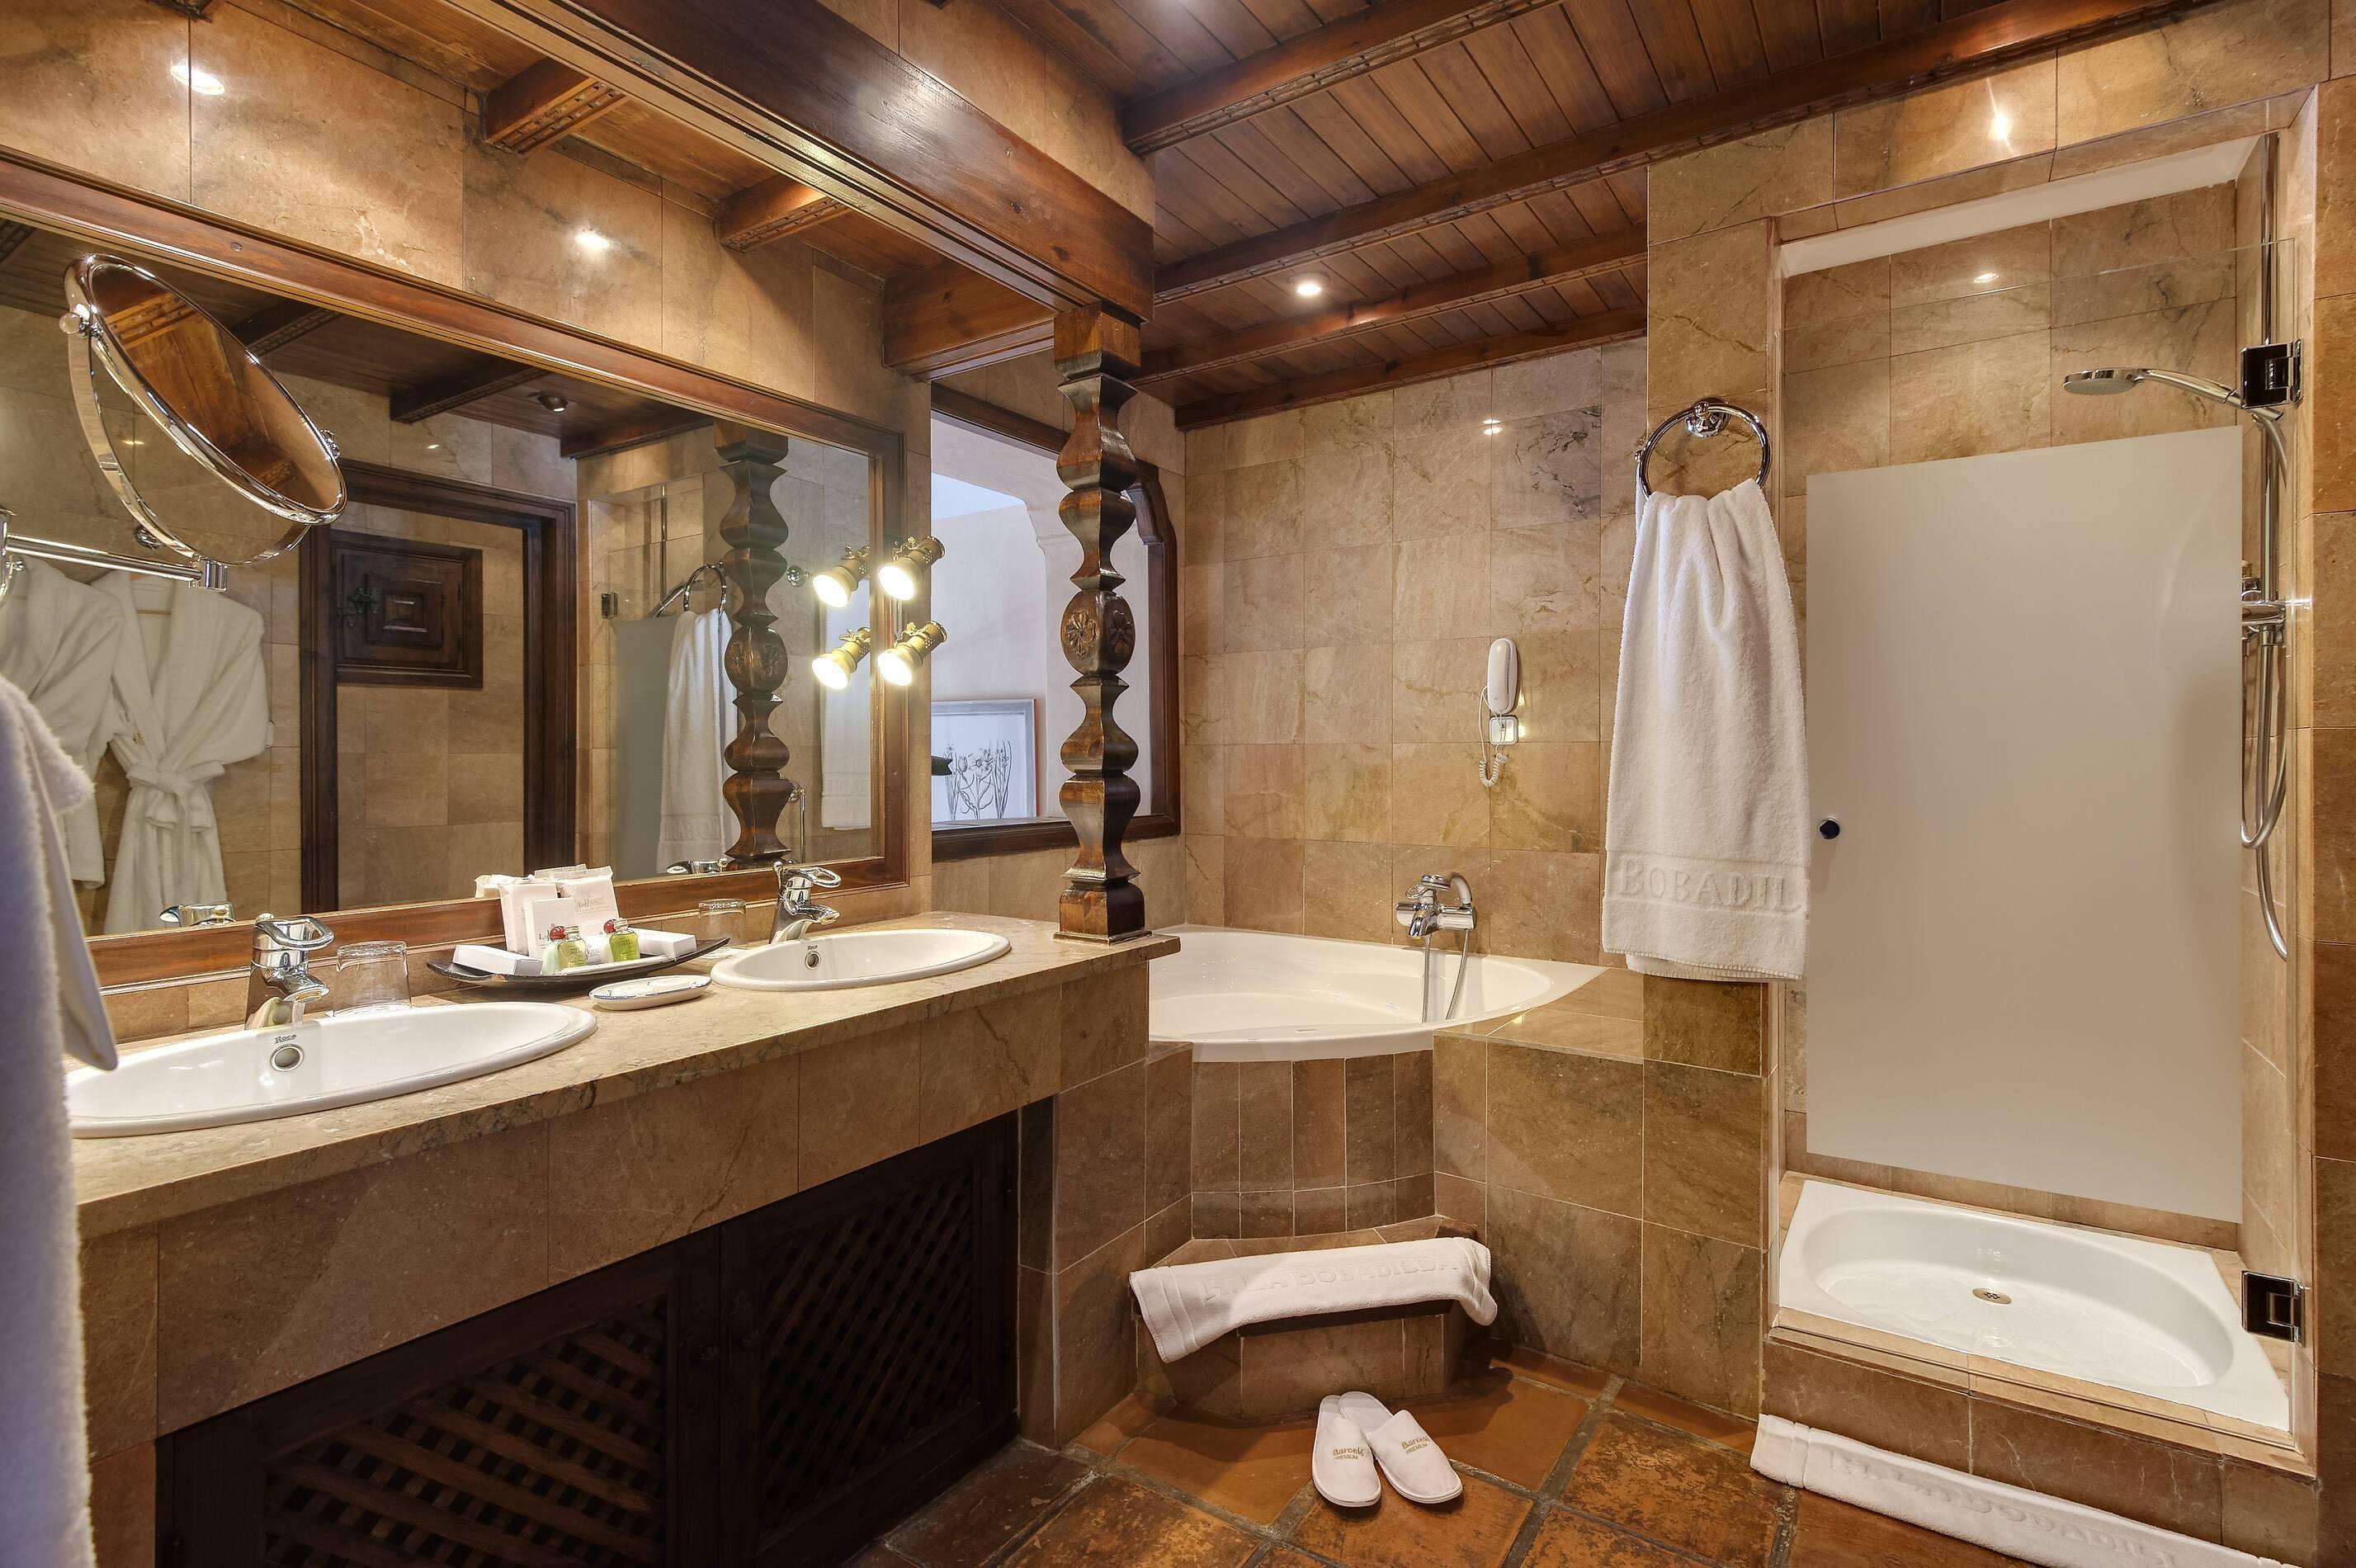 Barcelo la Bobadilla Andalousie suite superior deluxe salle de bain